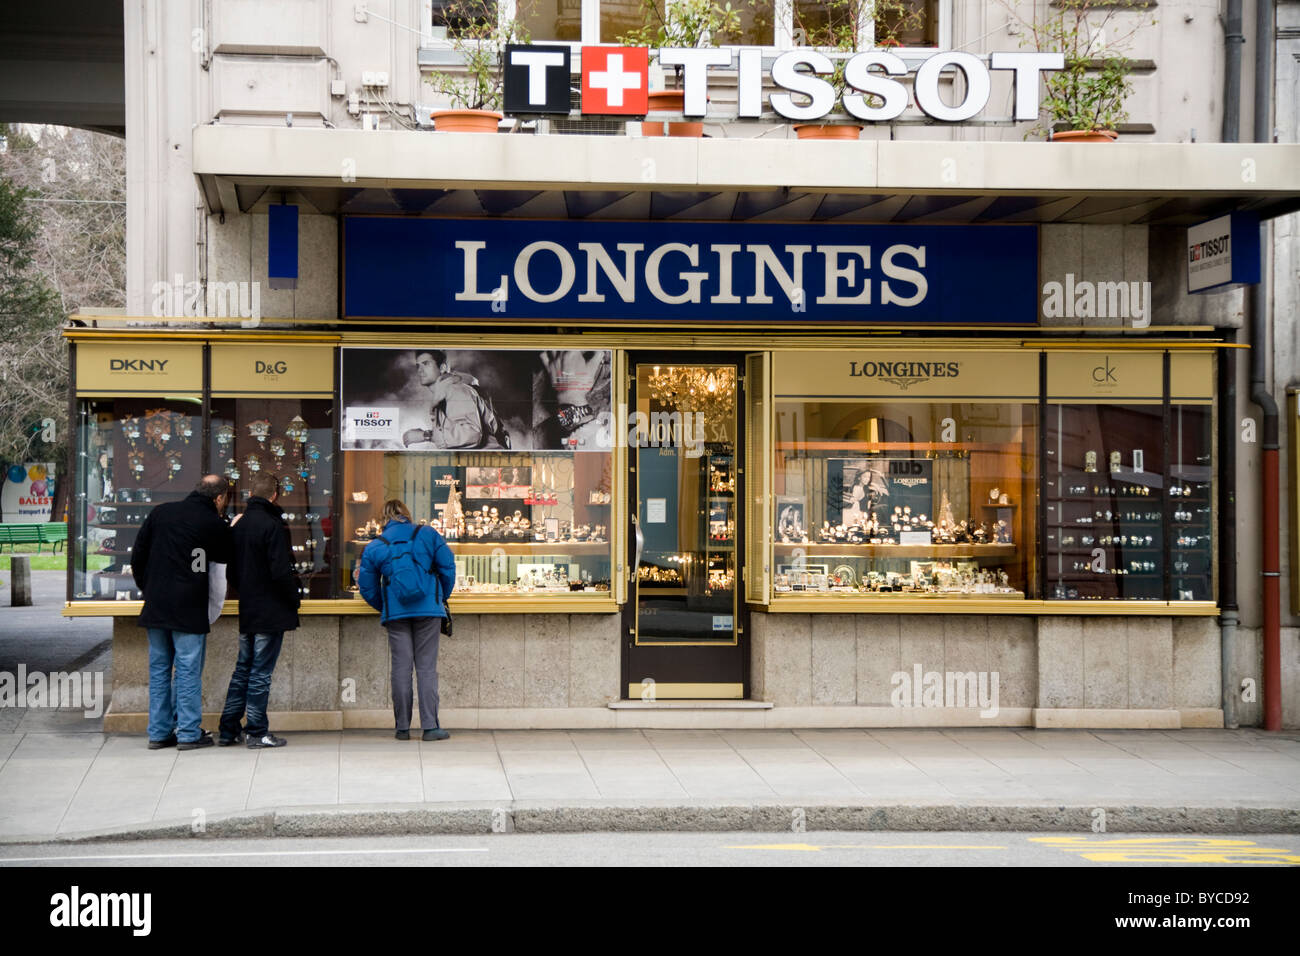 Jeweller / jewellers shop / store in Geneva selling Swiss made Tissot and Longines wrist watches. Geneve. Switzerland. - Stock Image